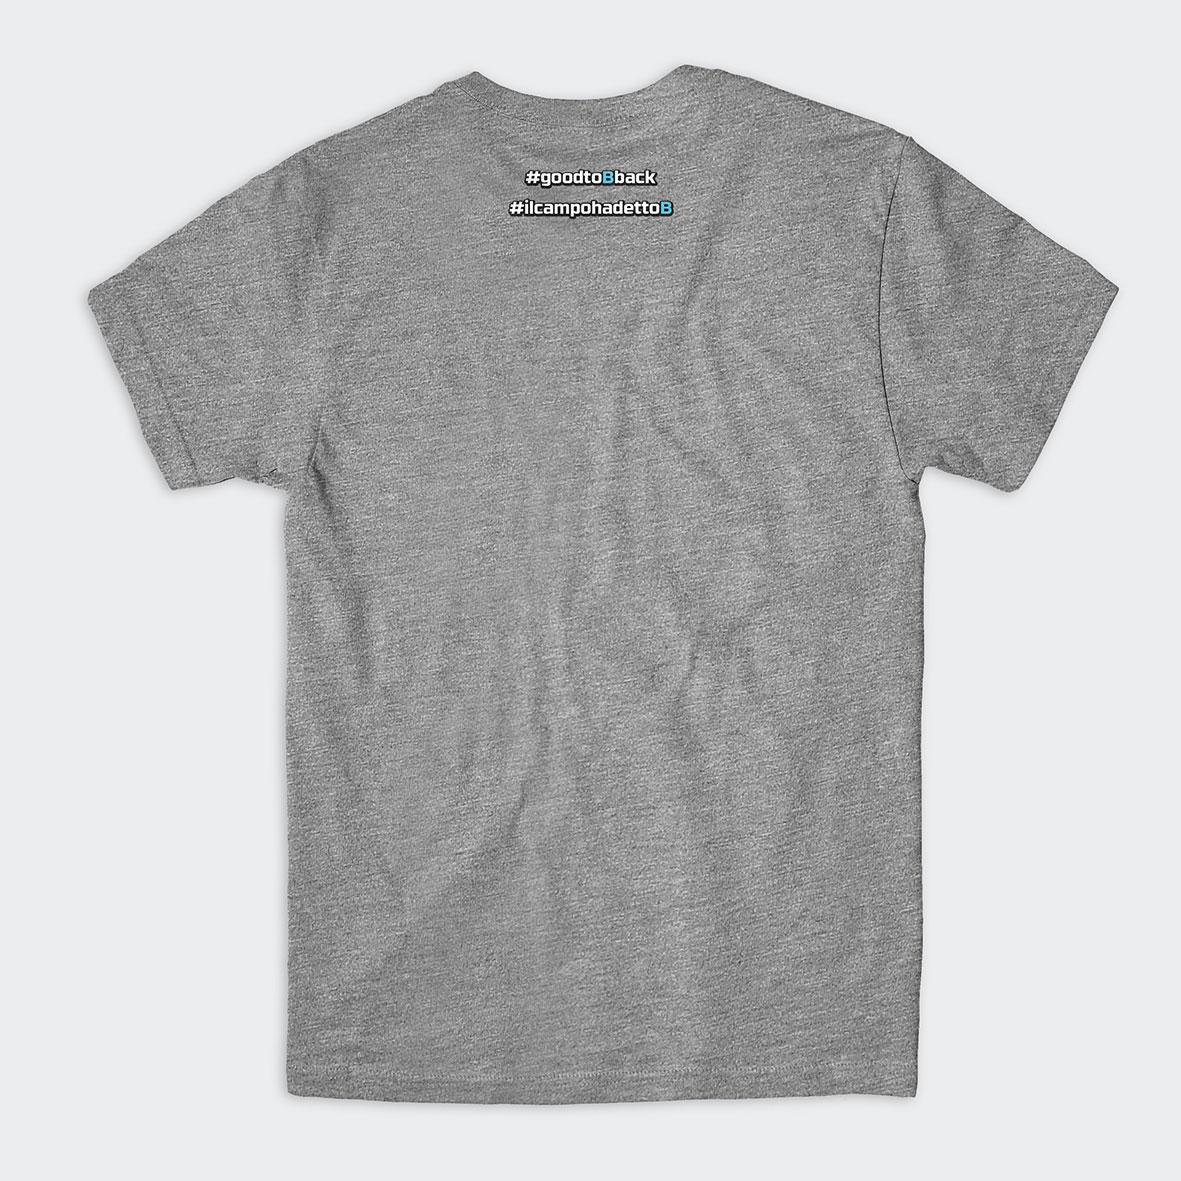 T-Shirt celebrativa promozione Serie B - Virtus Entella Store